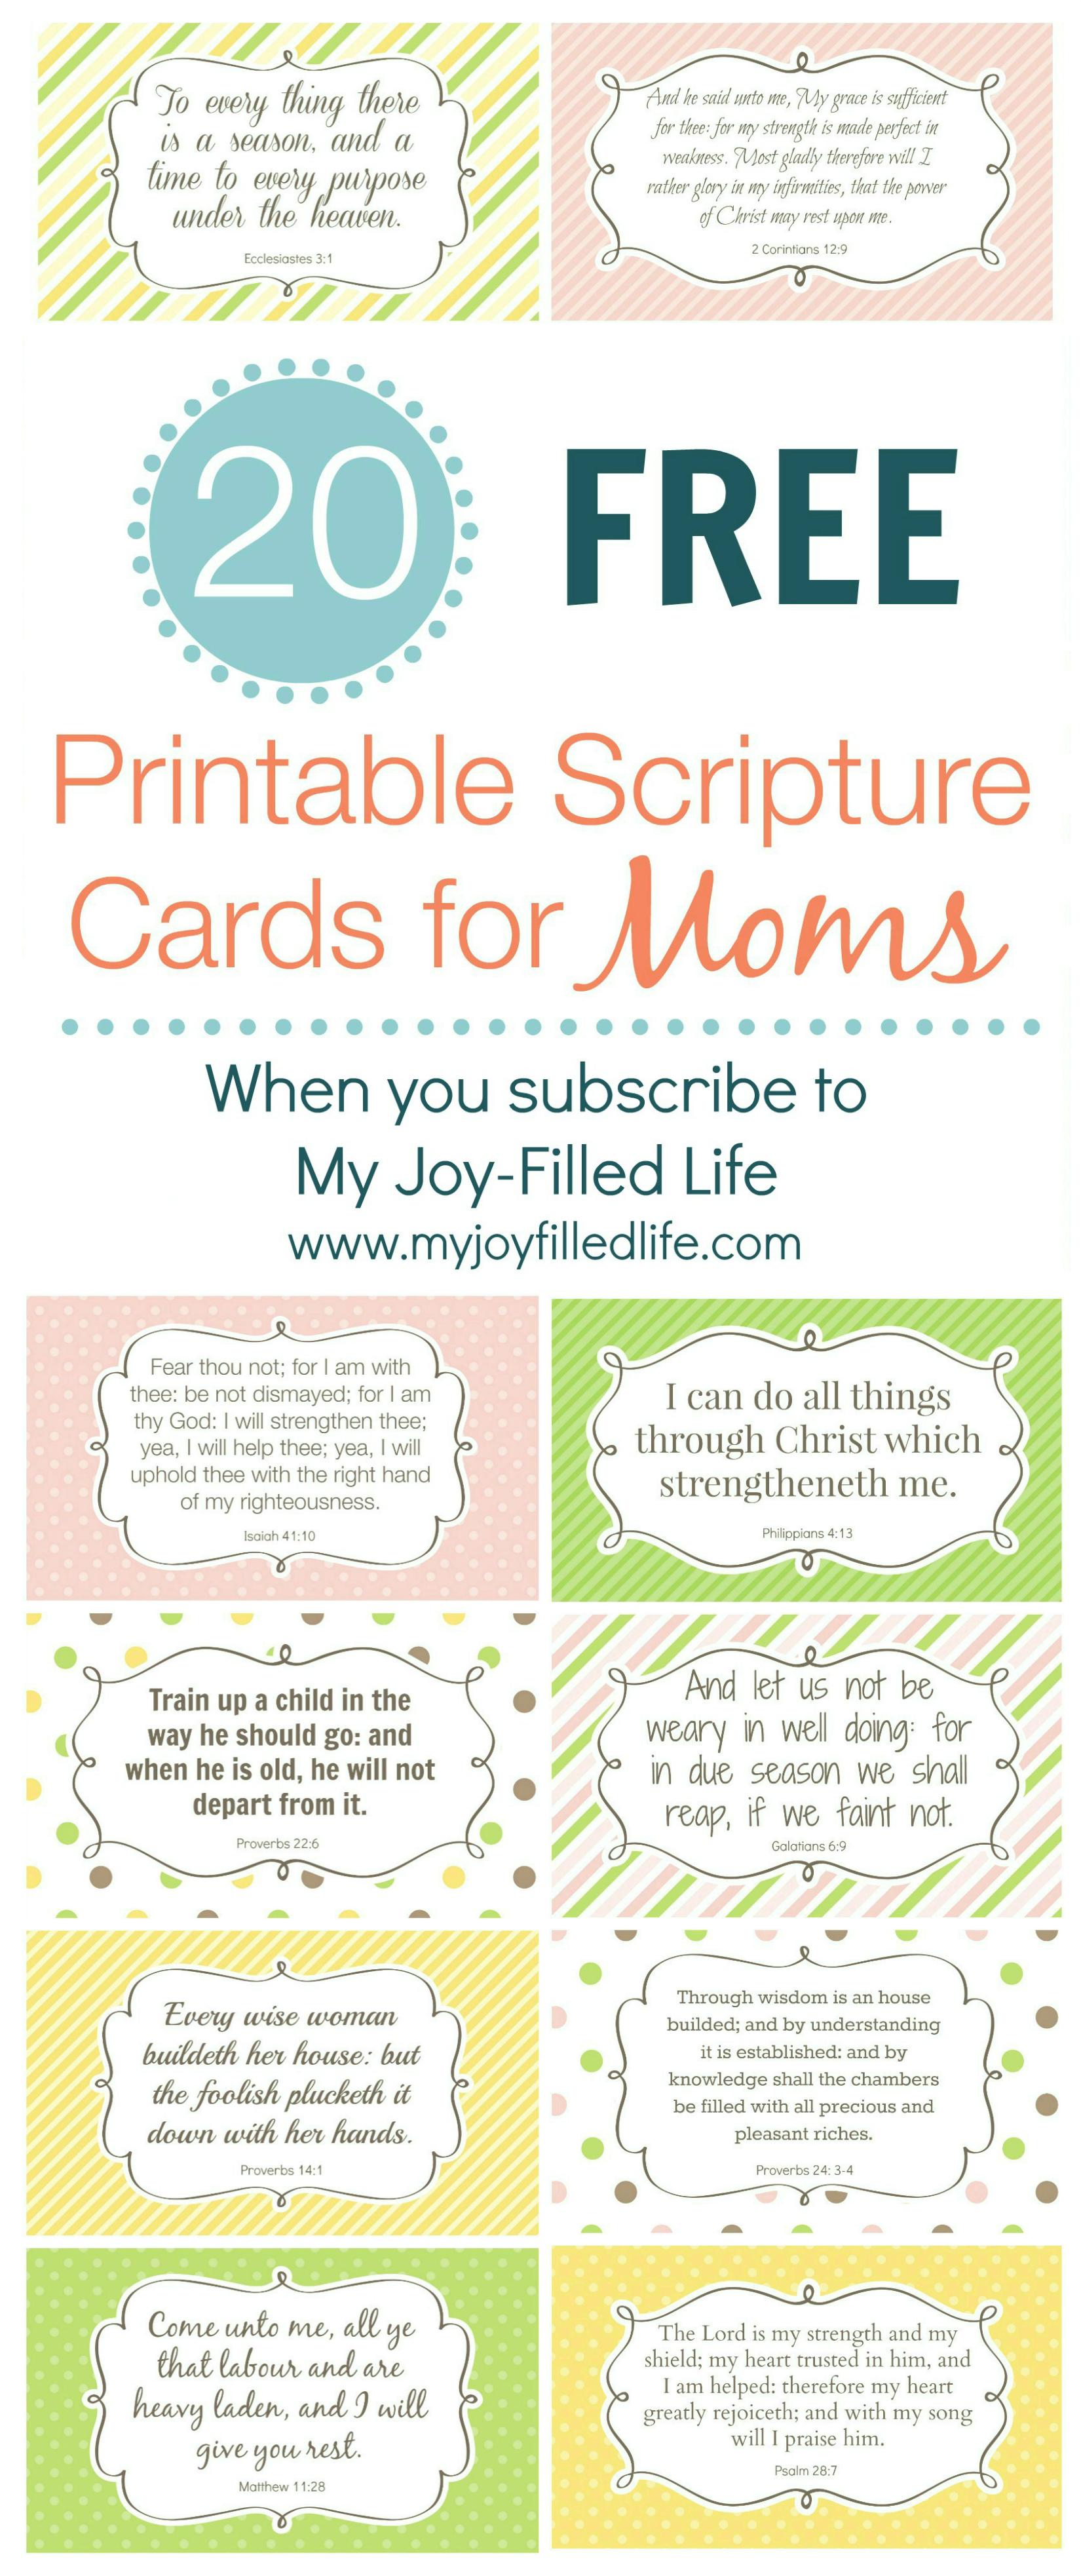 Encouragement For Moms - FREE Printable Scripture Cards - My Joy-Filled Life - Free PNG Encouragement